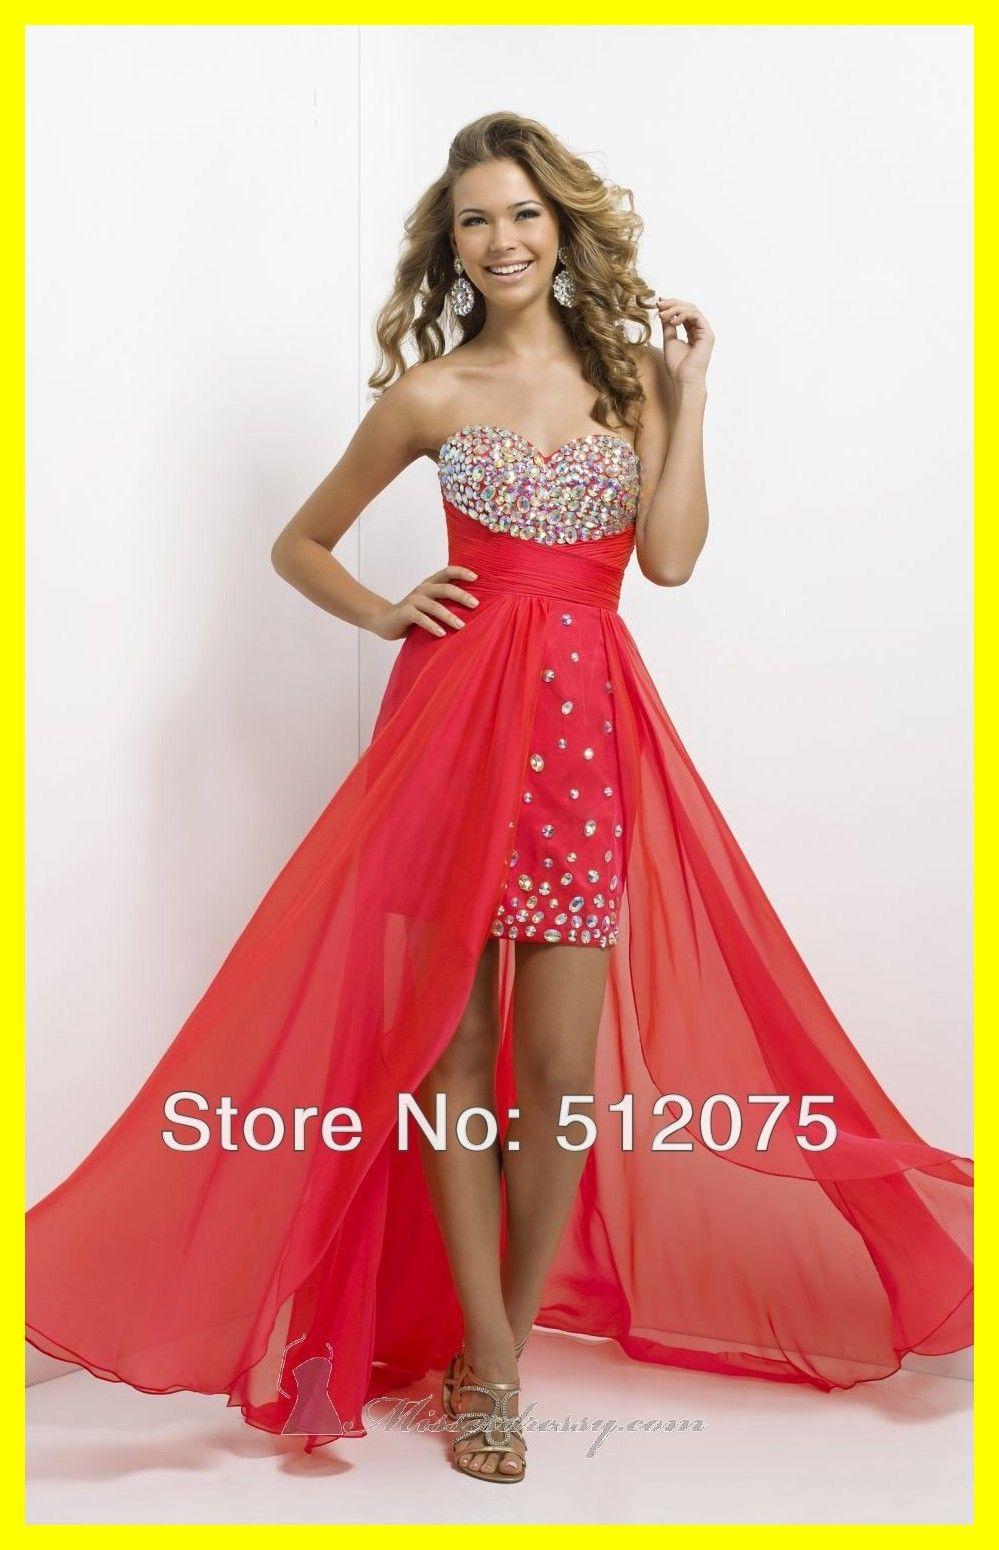 plus size dress rental nyc quiet   My Fashion dresses   Pinterest ...